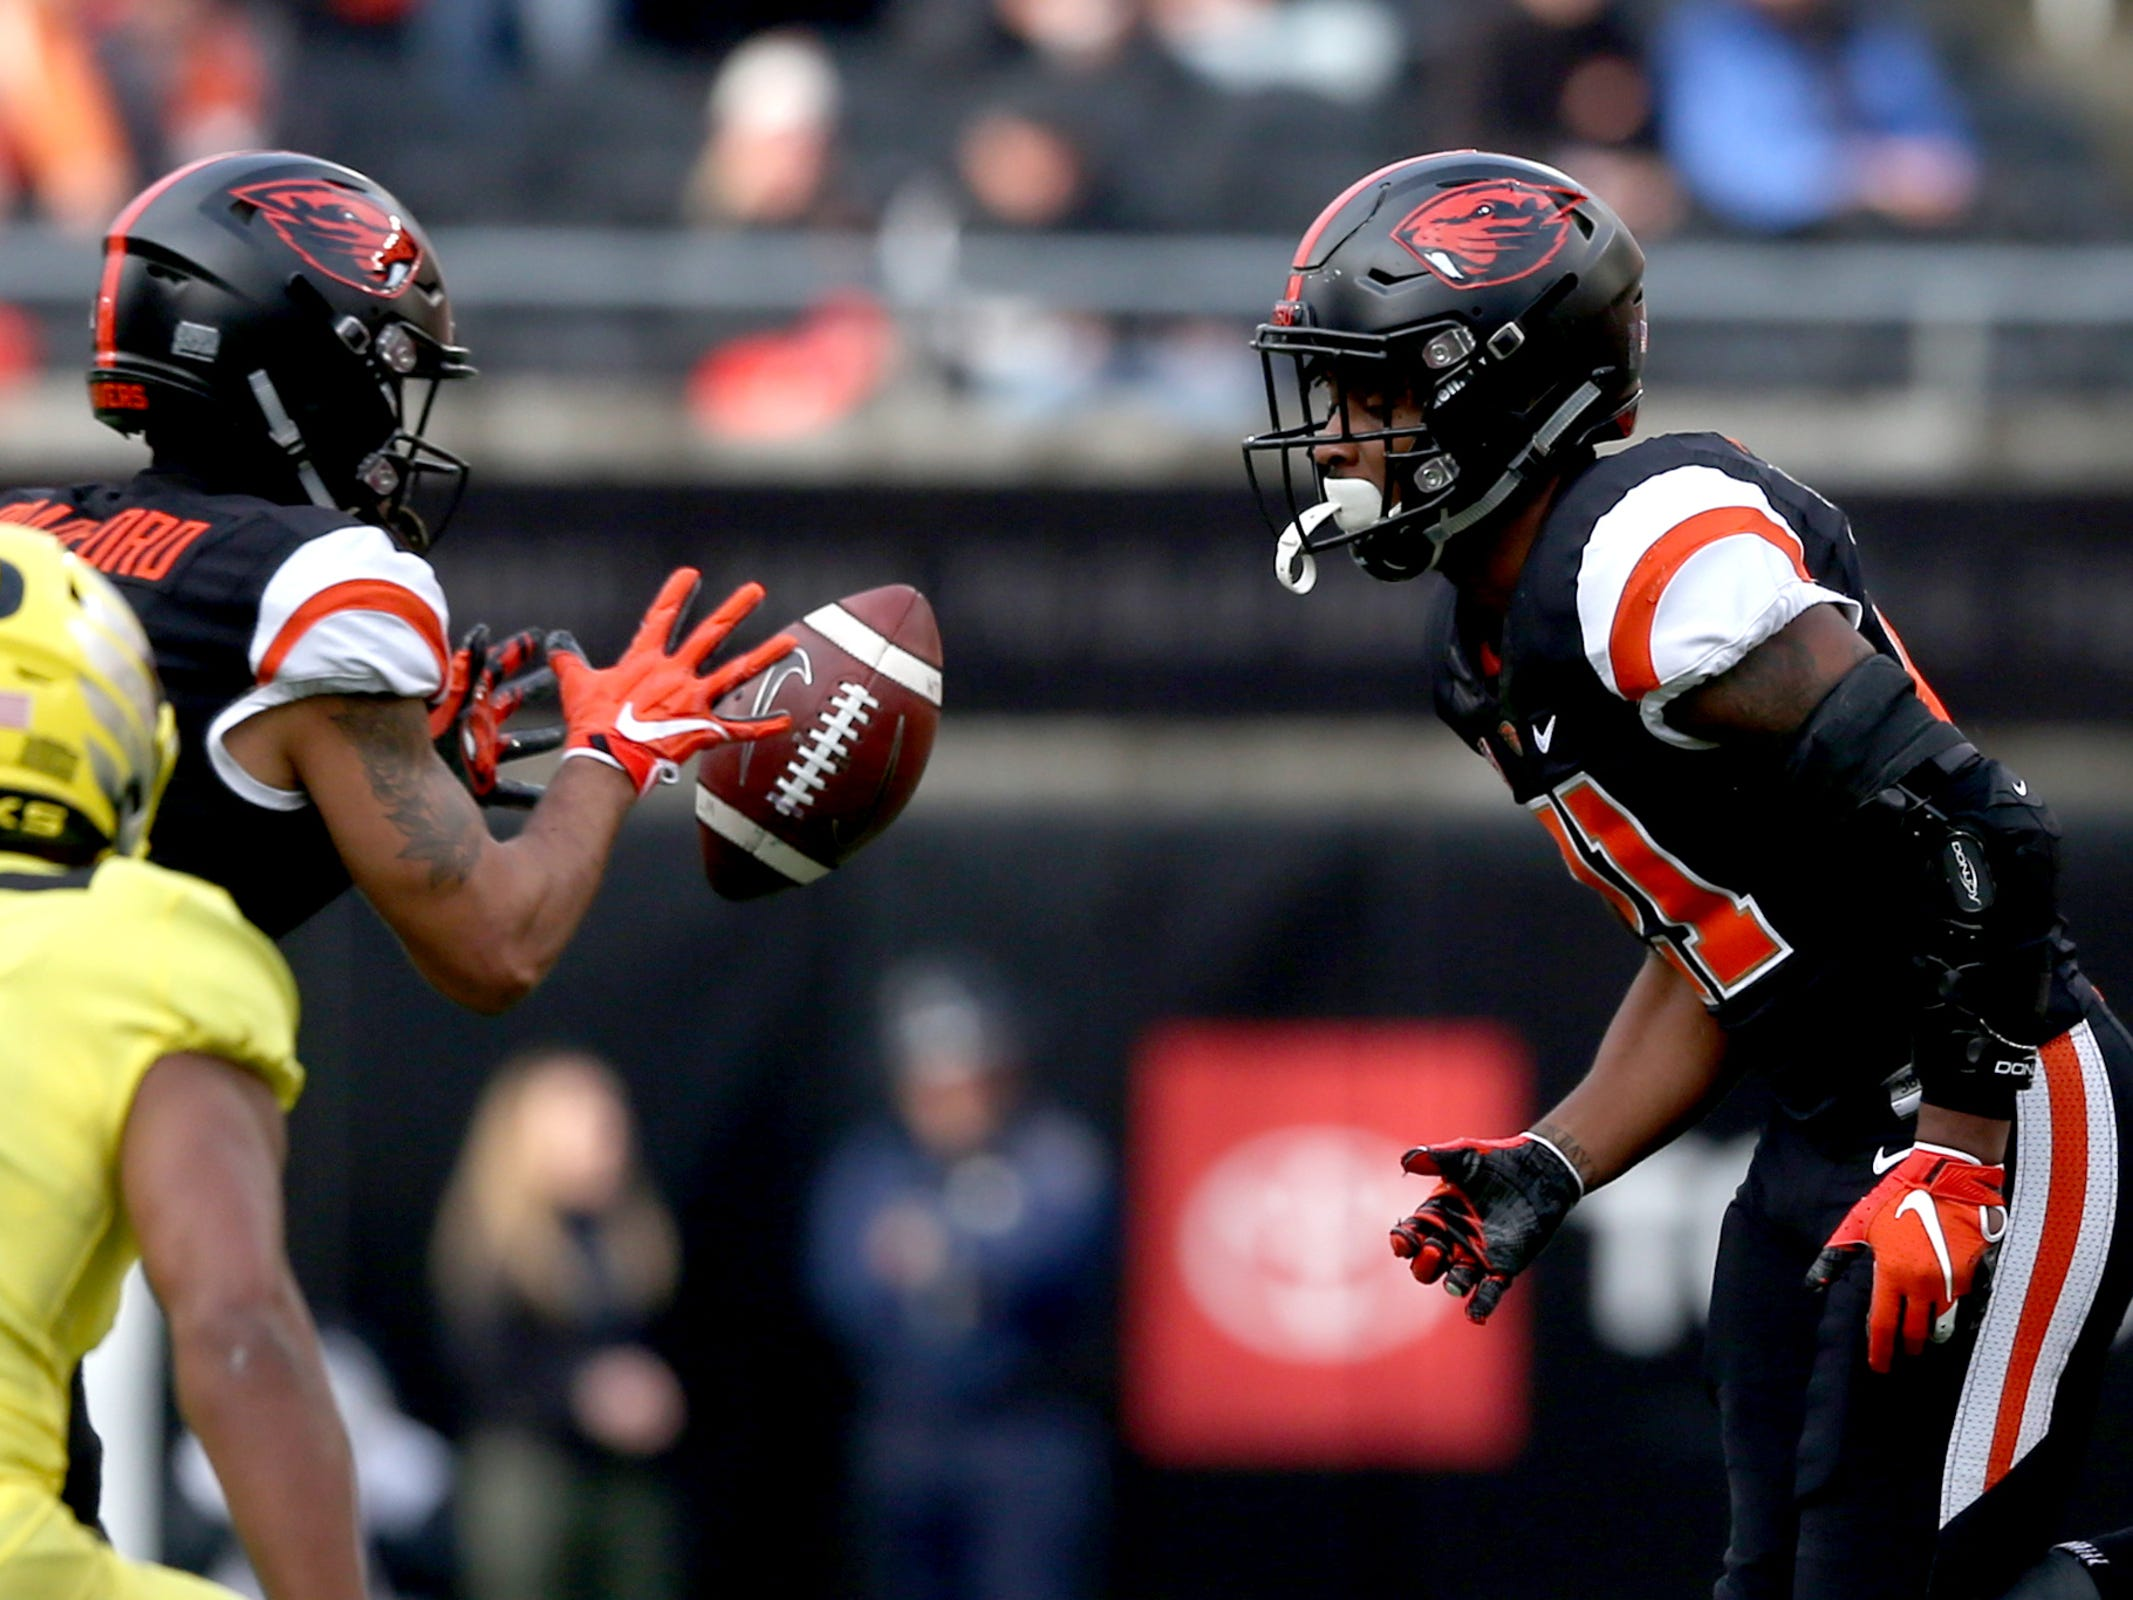 Oregon State's Jaden Robinson (21) passes the ball to teammate Trevon Bradford (8) in the Oregon vs. Oregon State Civil war football game at Oregon State University in Corvallis on Friday, Nov. 23, 2018.